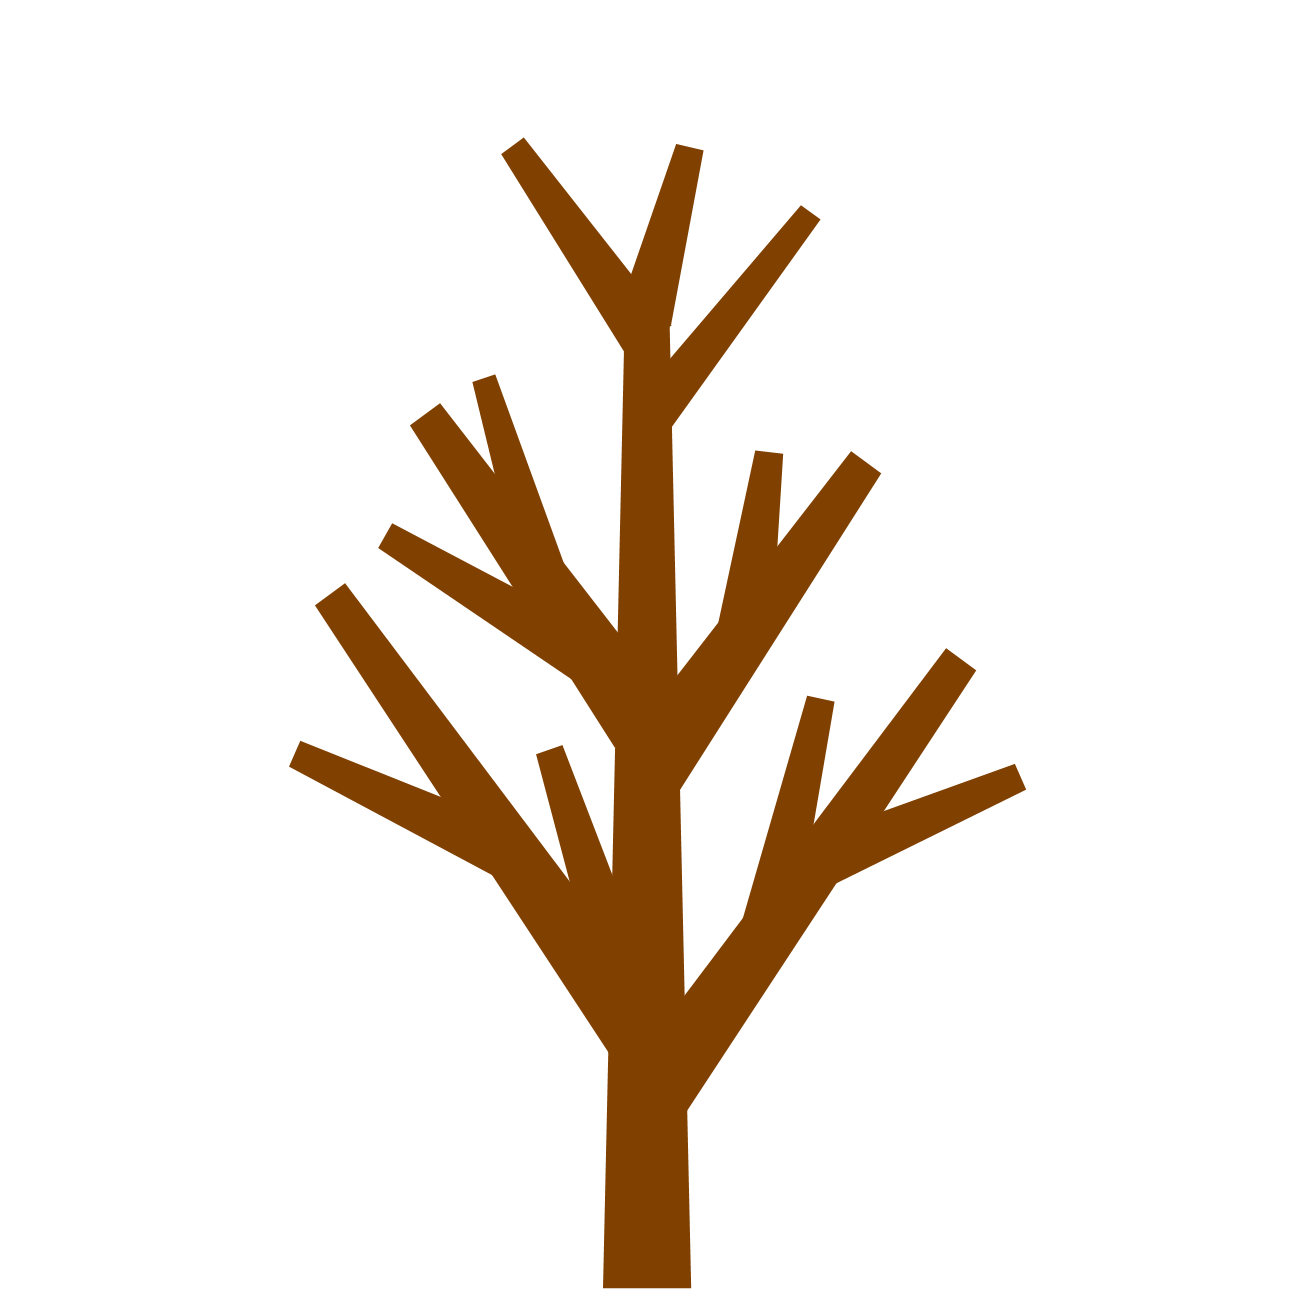 Tree With No Leaf